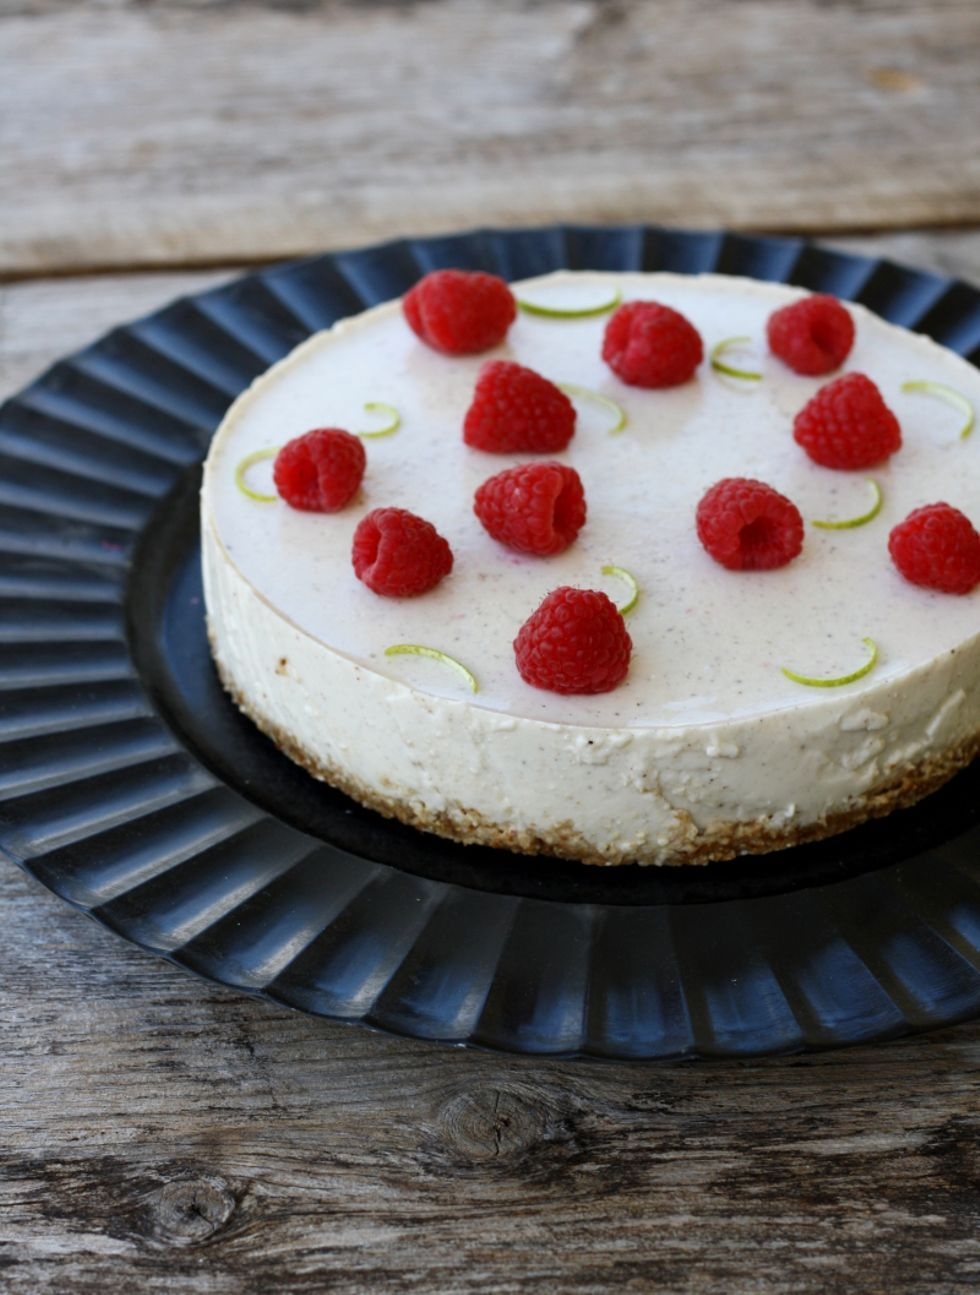 lindastuhaug | Den beste ostekaka uten tilsatt sukker! - lindastuhaug